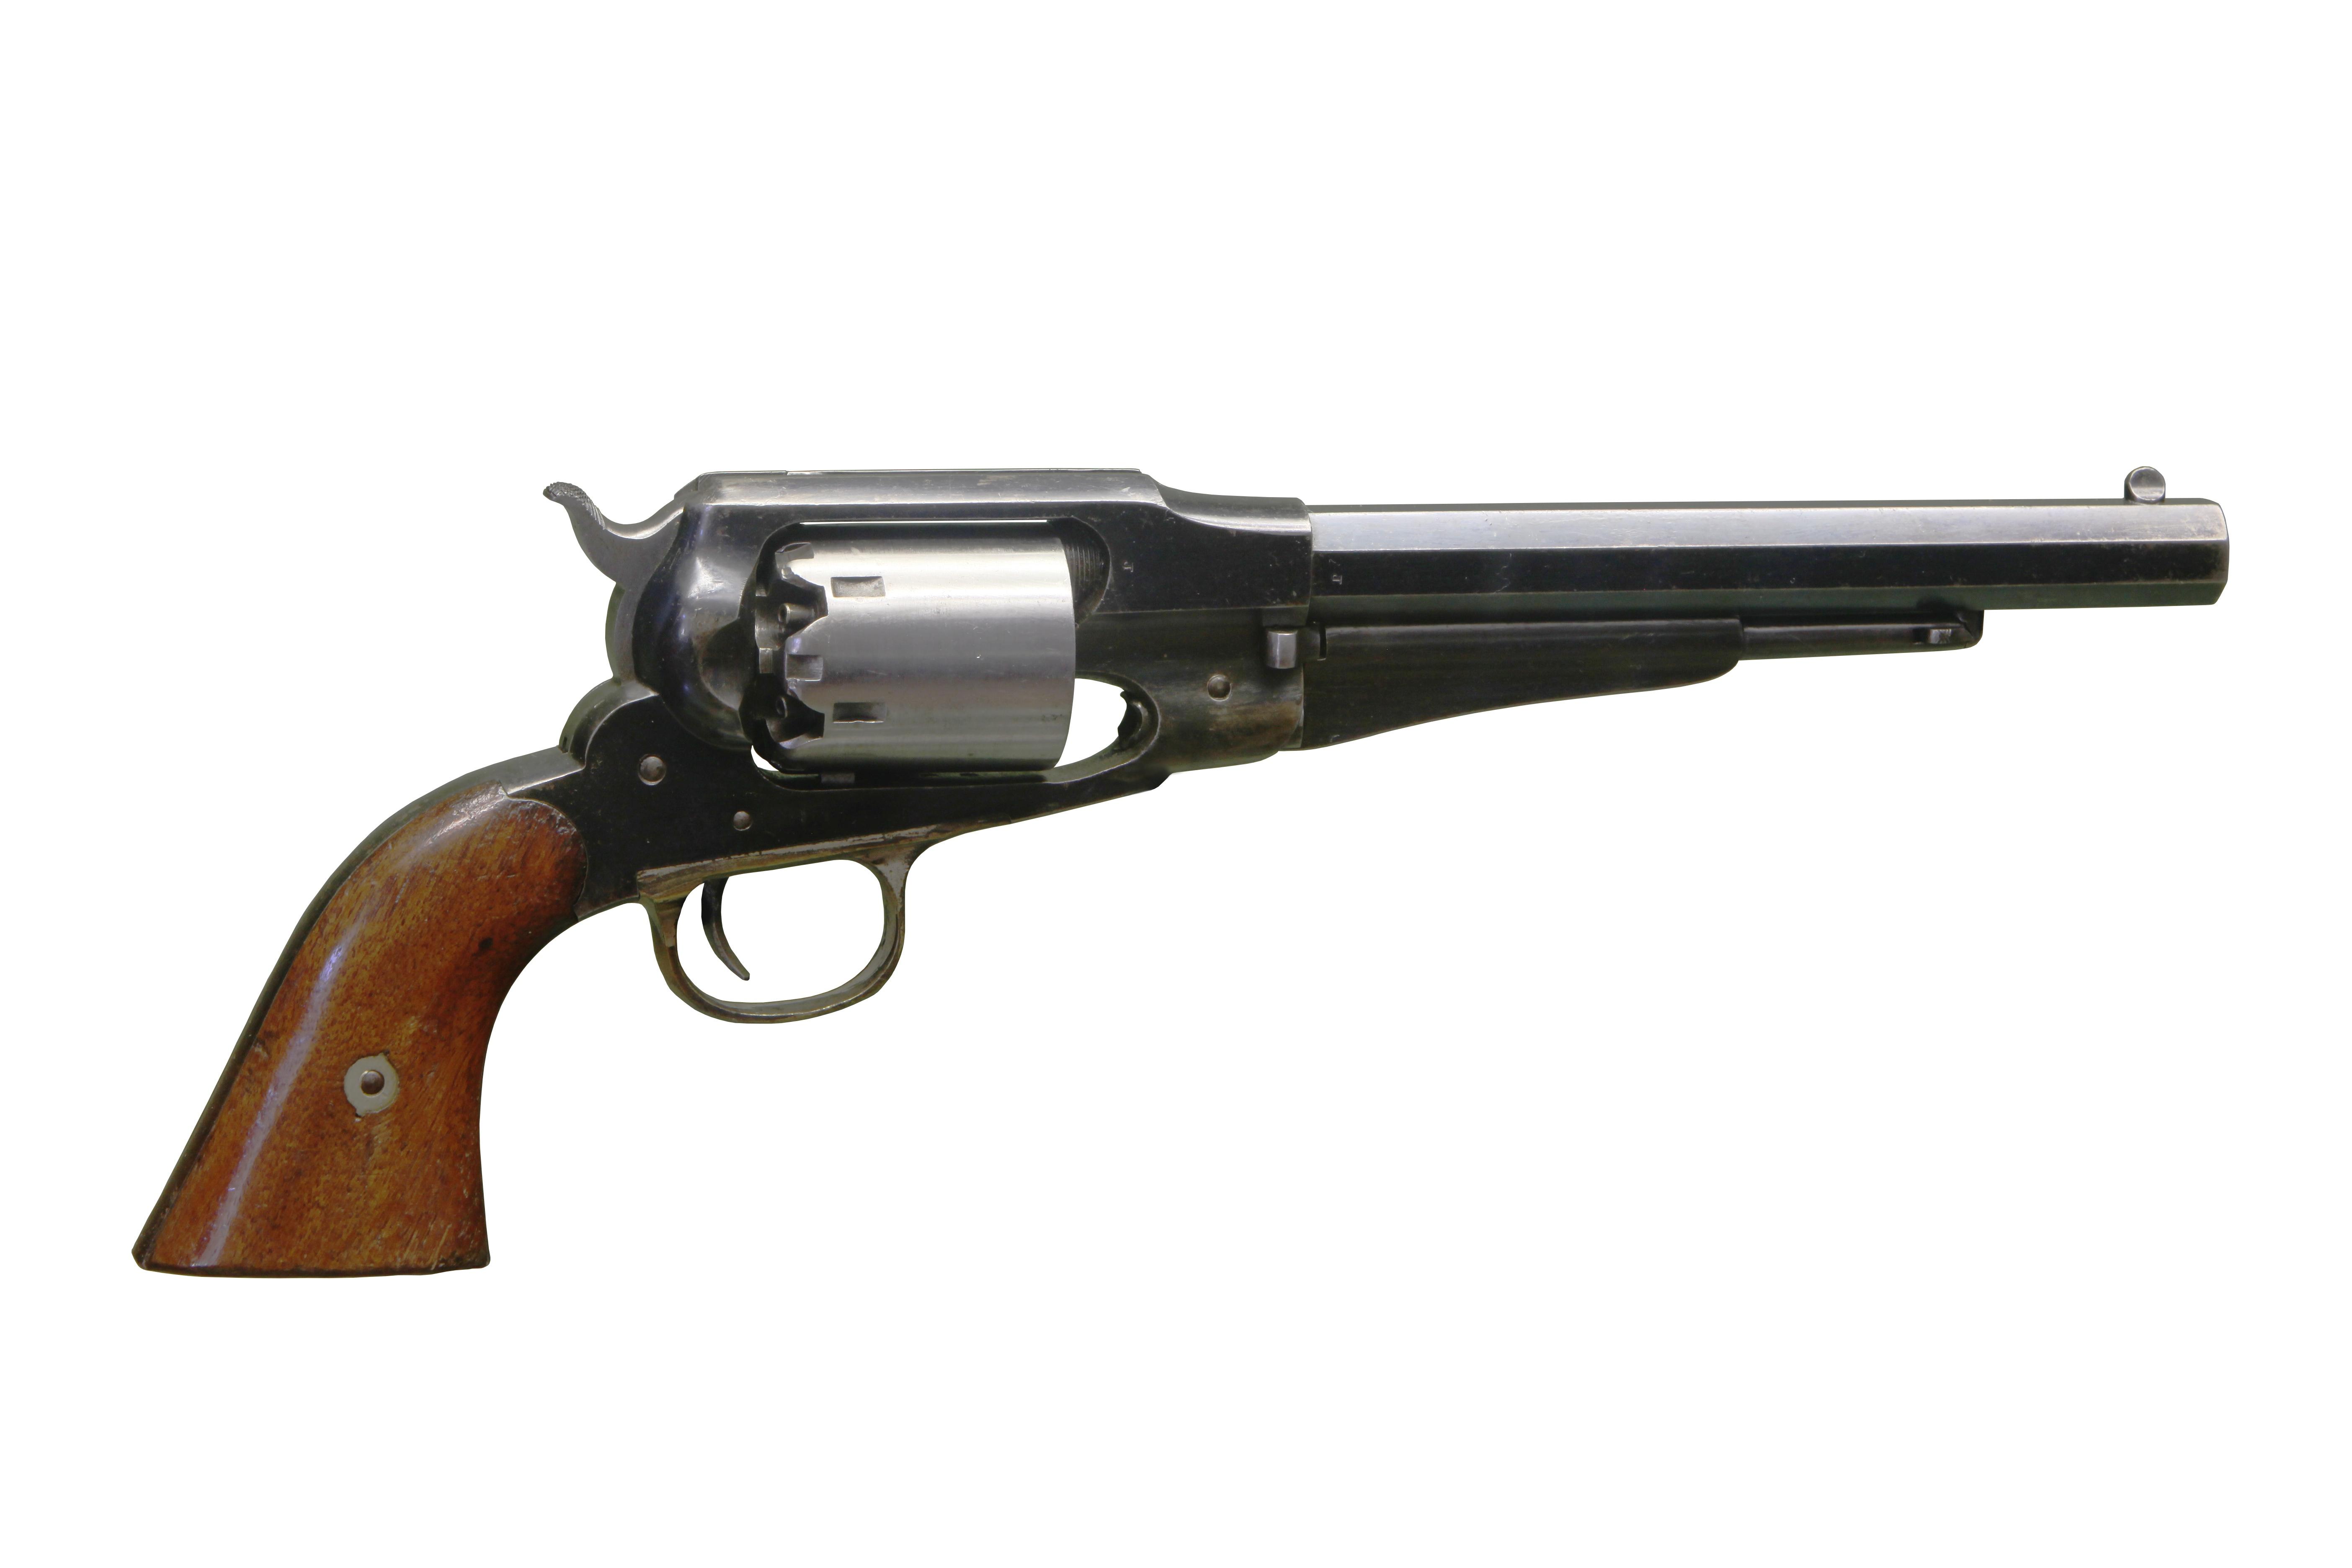 Remington pistol dating